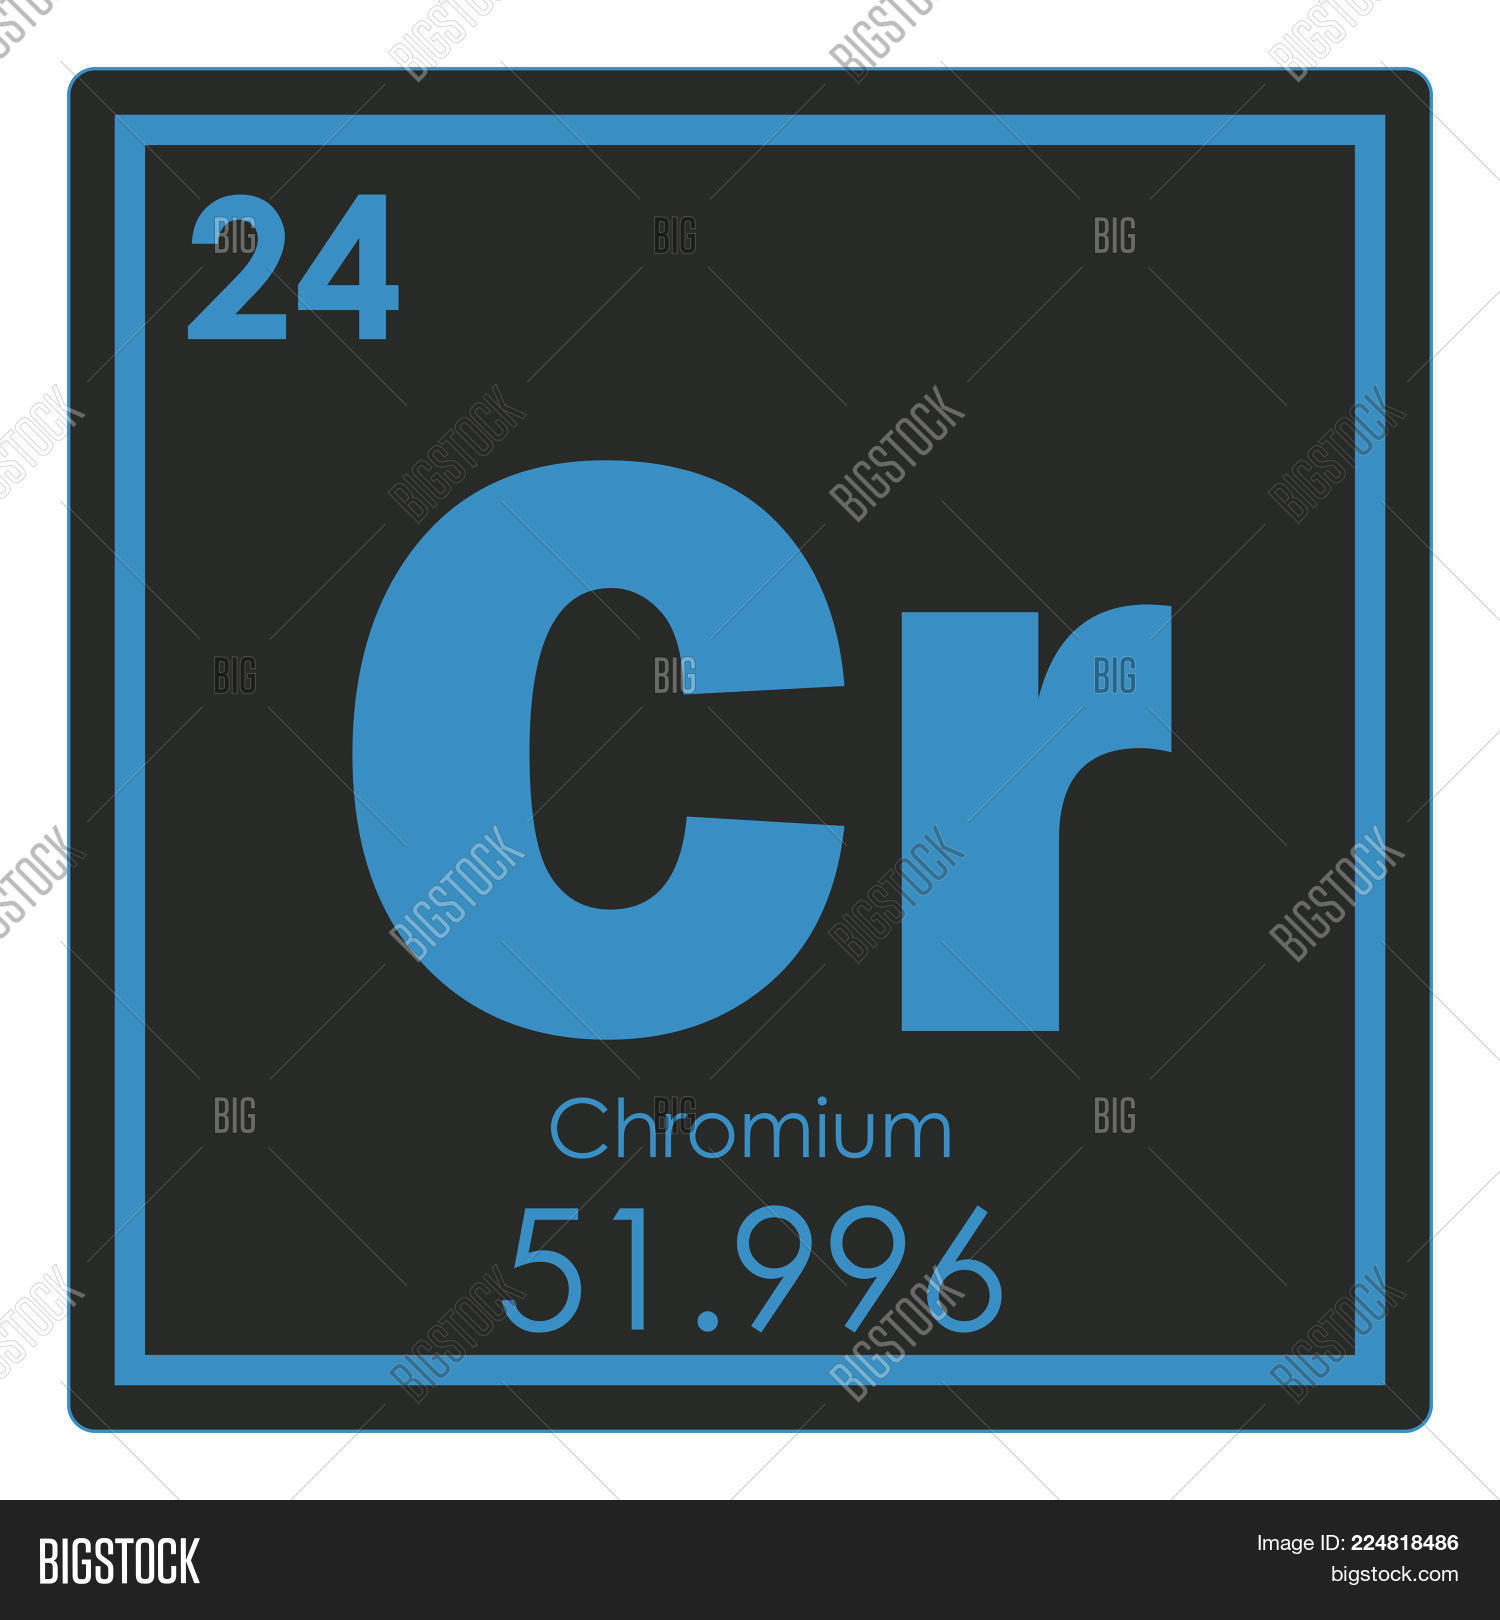 Chromium Chemical Image Photo Free Trial Bigstock